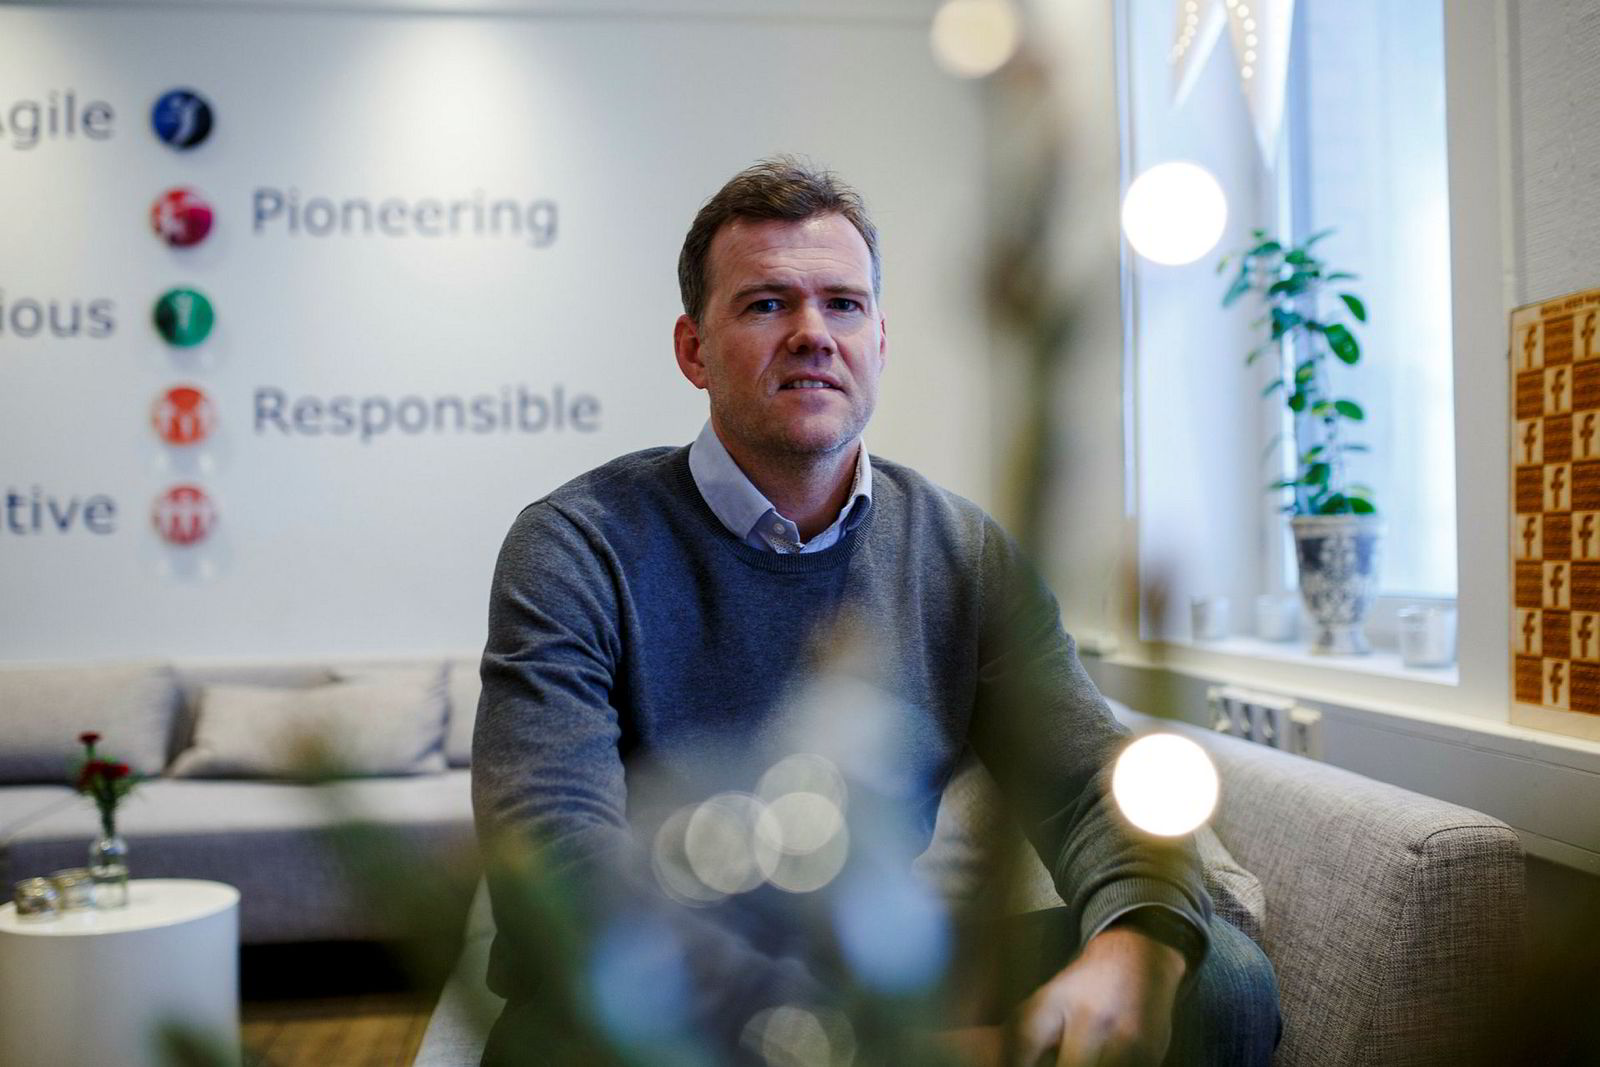 Tv- og radiosjef Morten Wiberg i Carat lar seg ikke overraske over hvor lite nordmenn ser på lineær-tv.